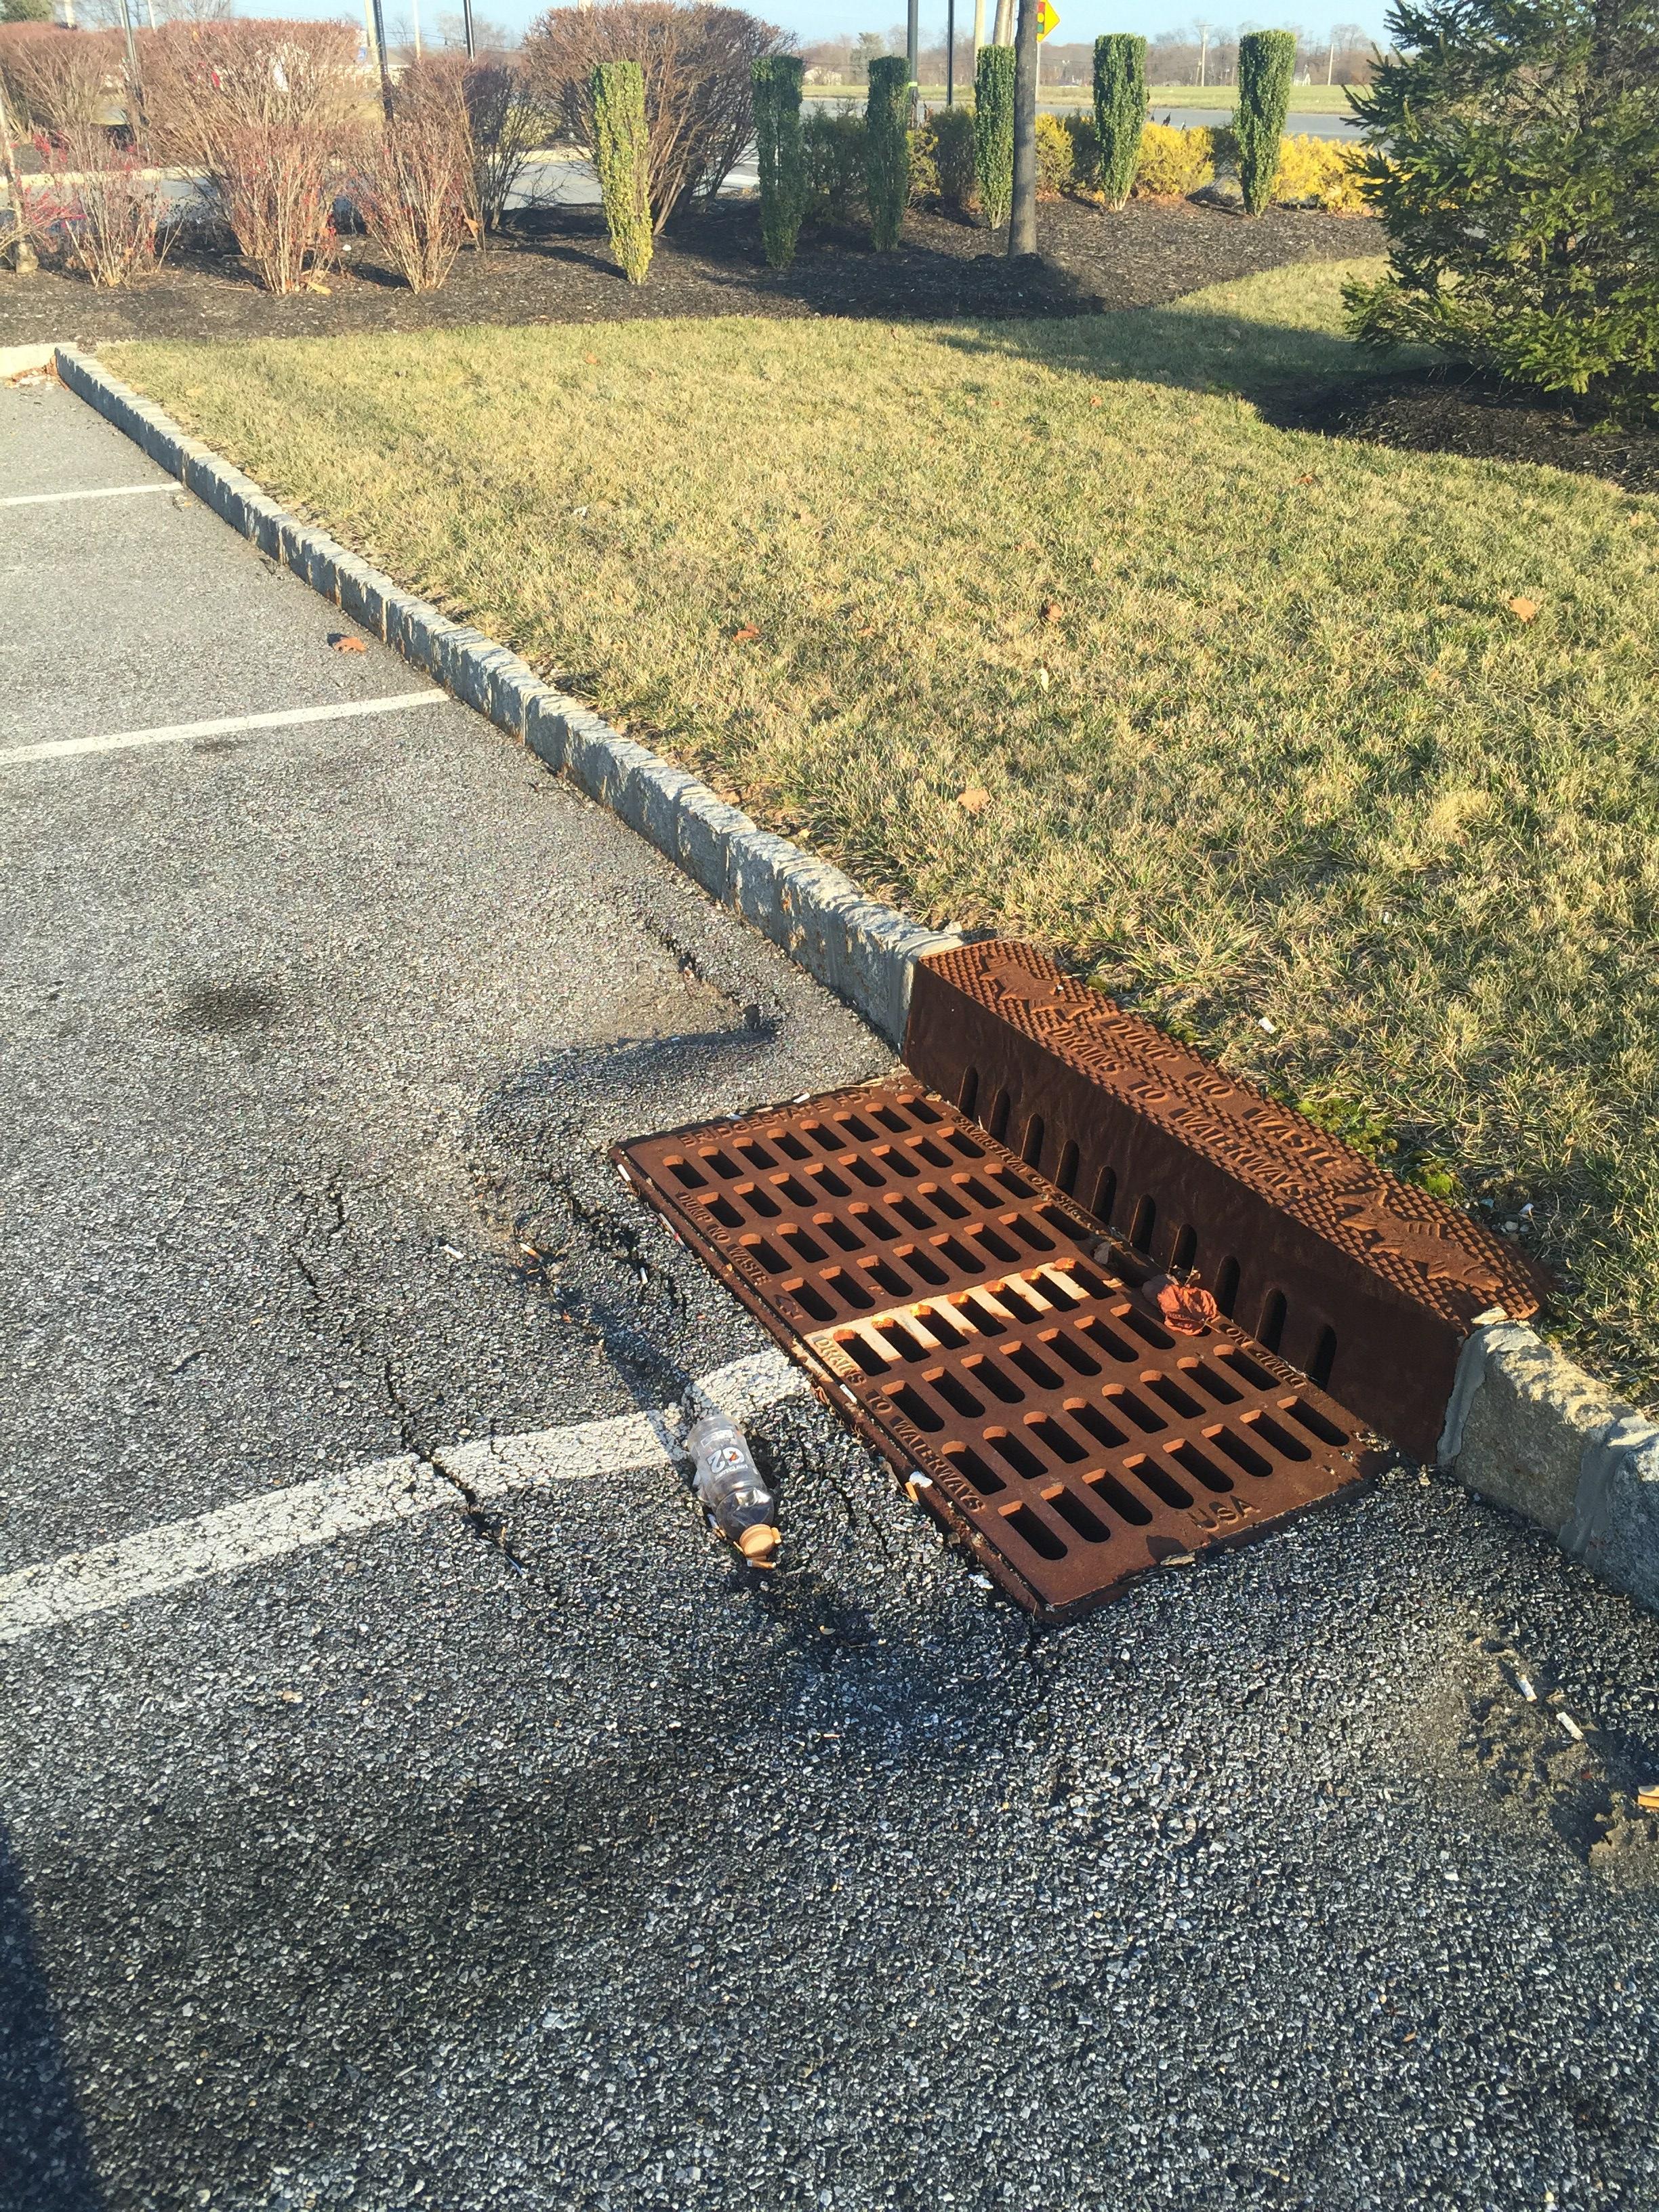 Why Do Parking Lot Catch Basins Fail